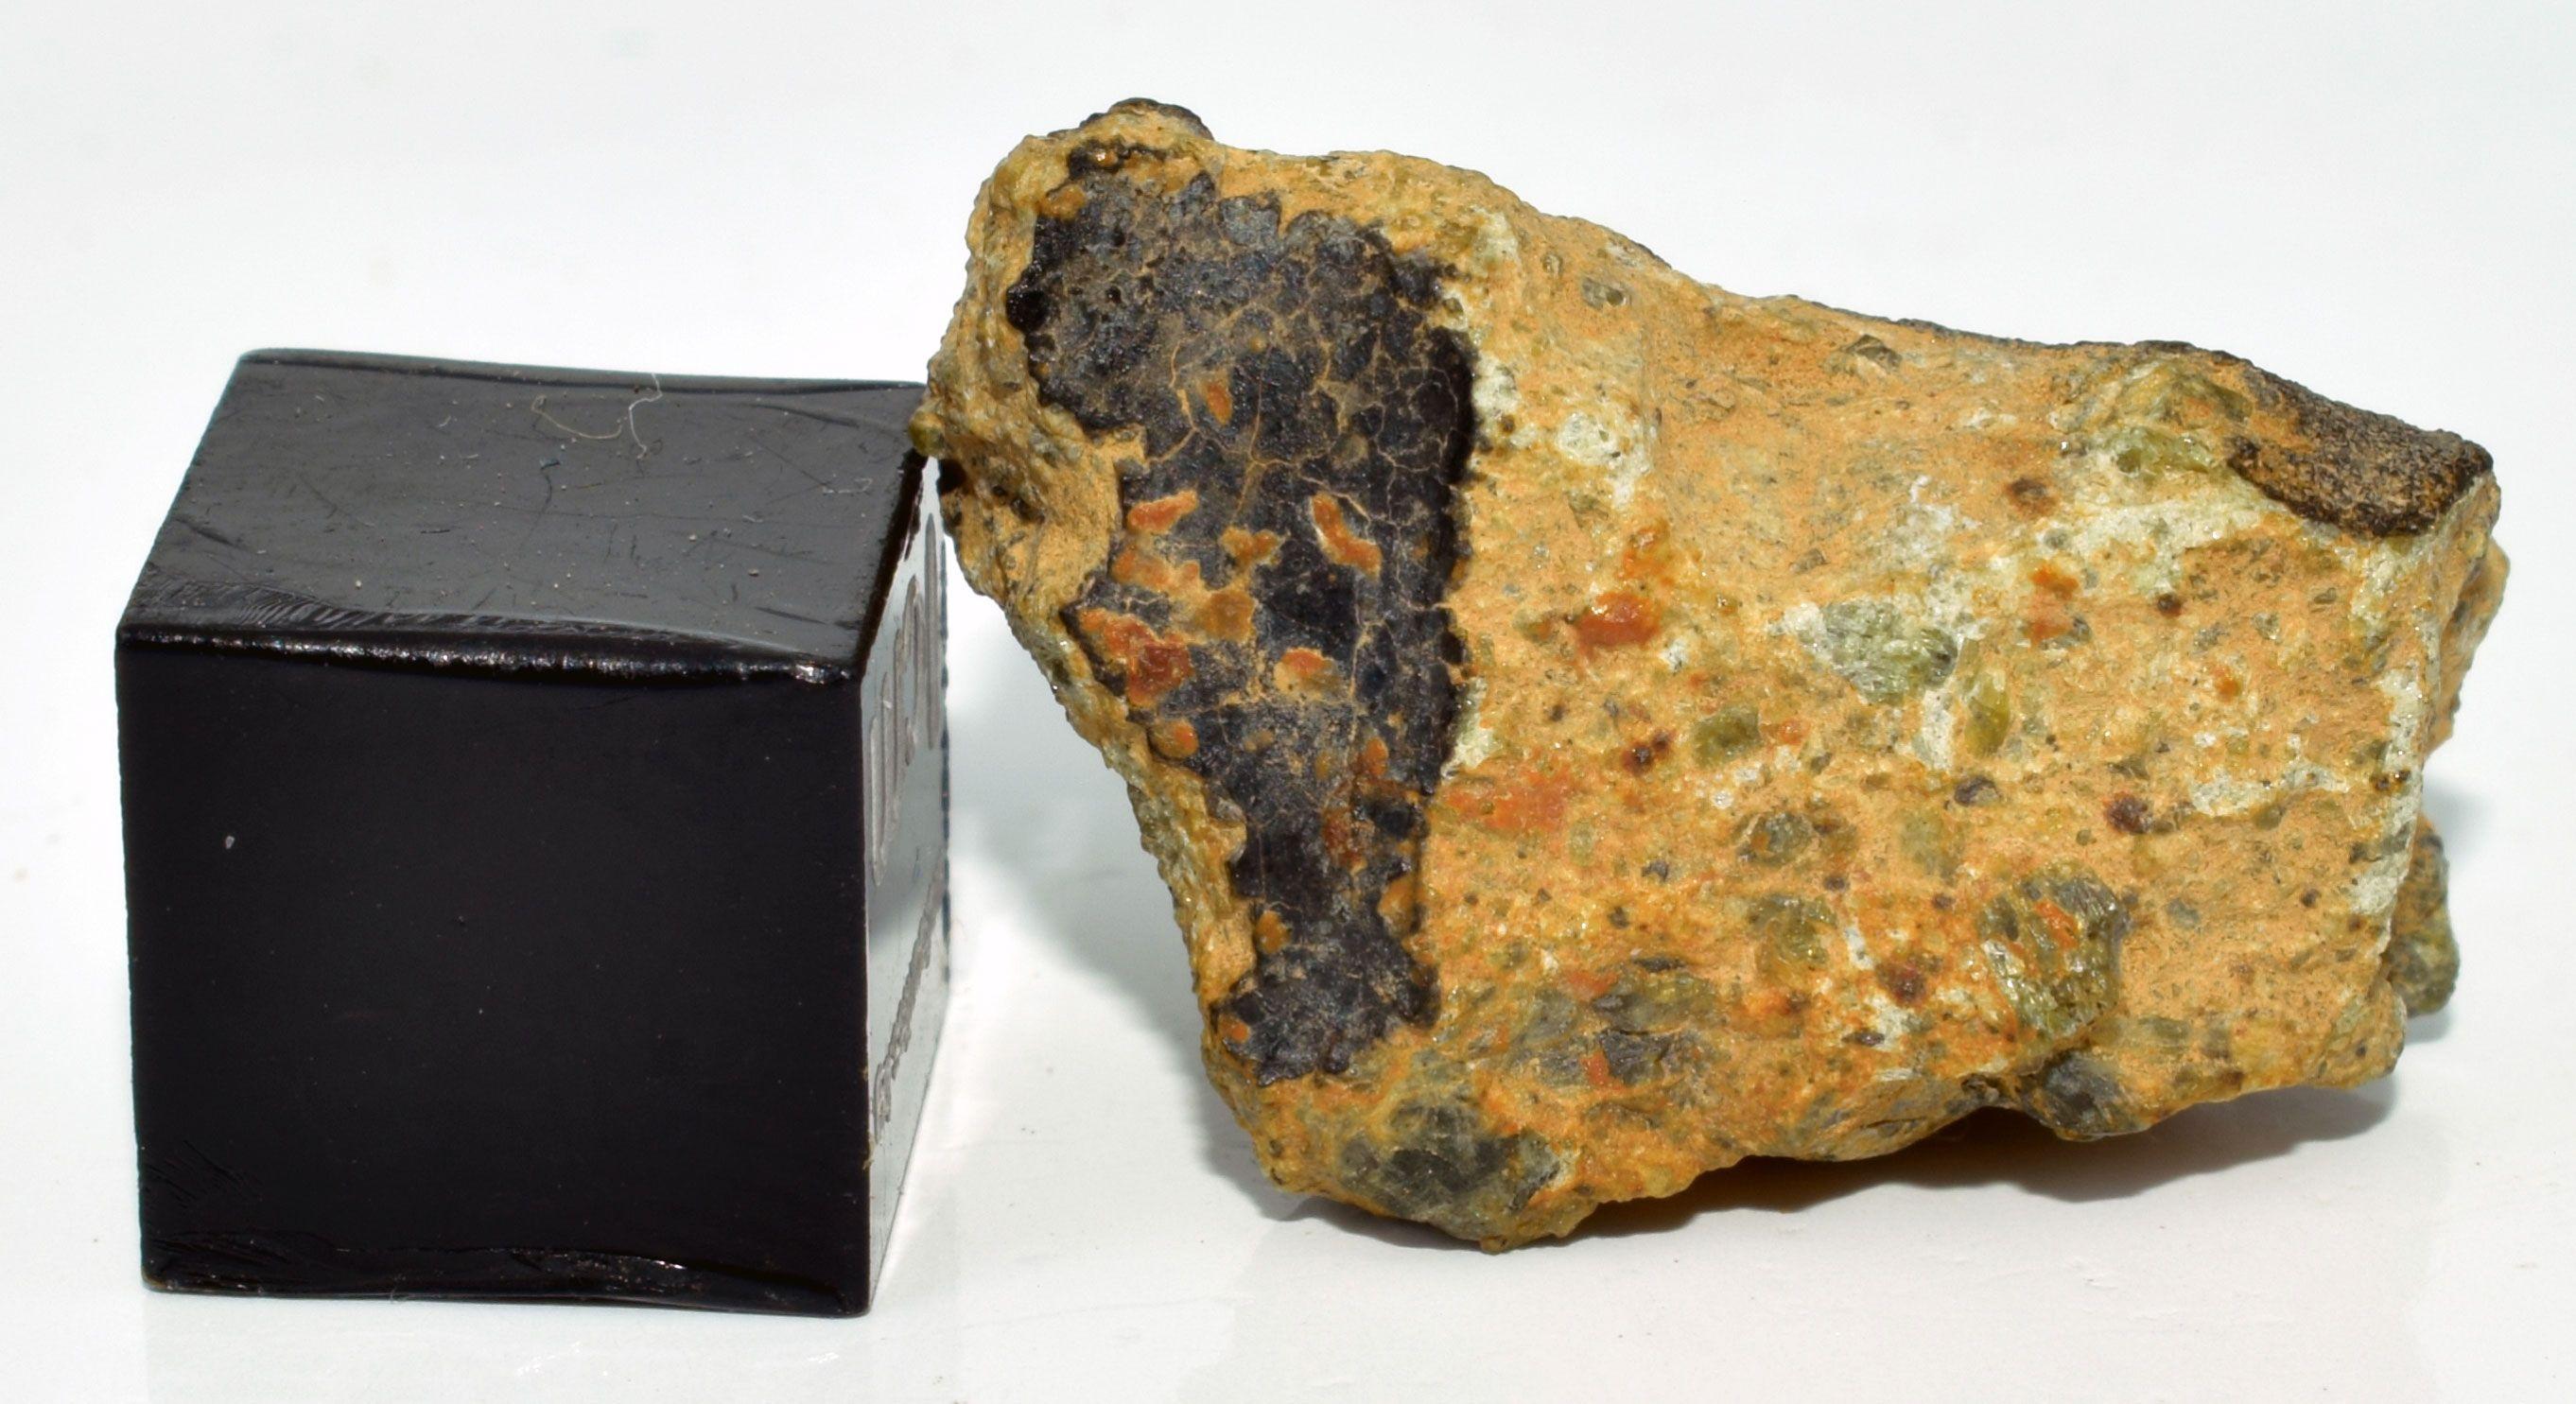 Diogenite Meteorite New Find Iron Meteorite Meteorite Stone